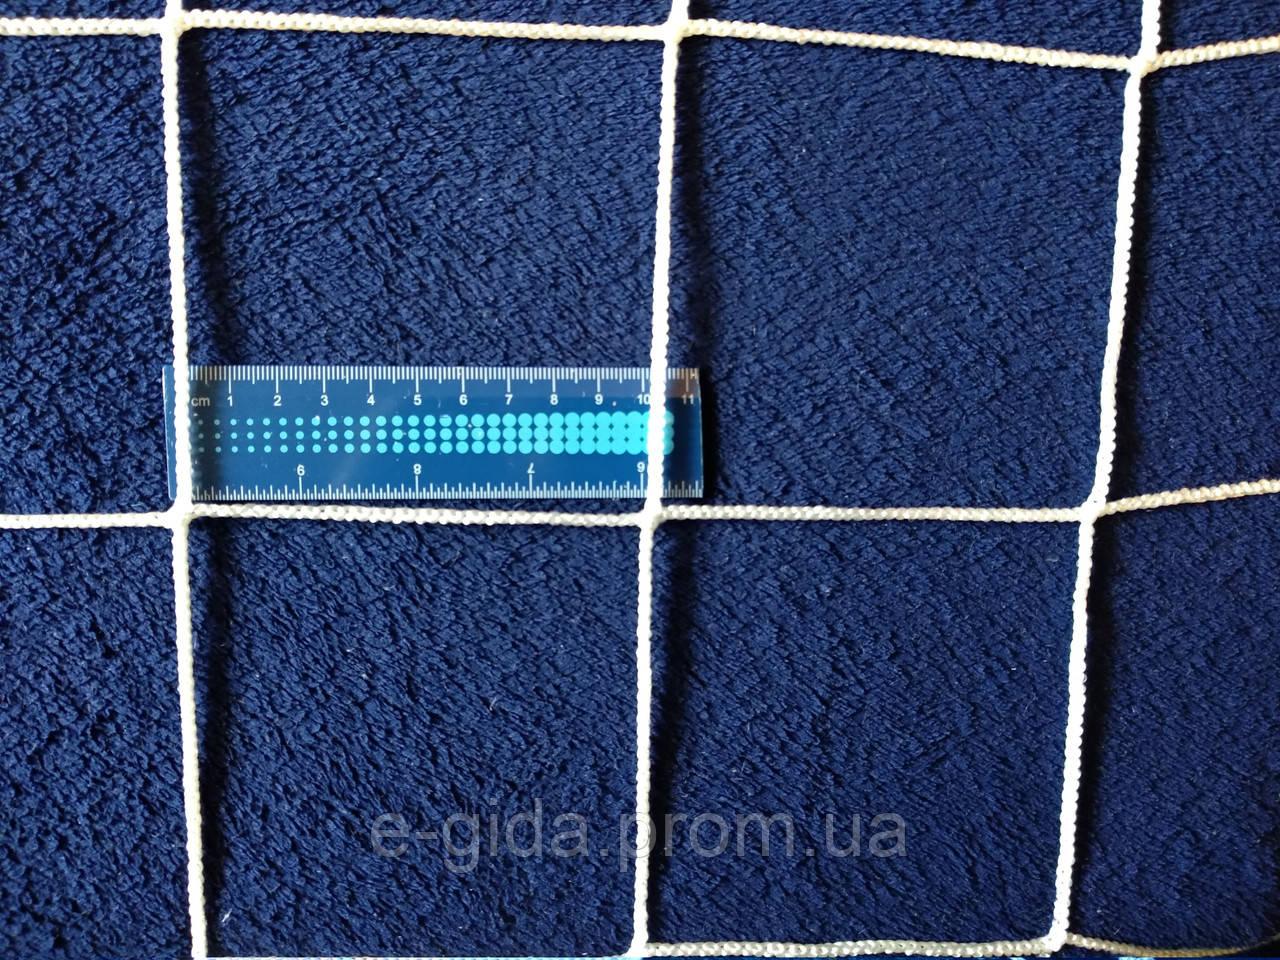 Сітка безвузлова 80х80 поліамід 2.8мм Сетка безузловая заградительная защитная 80